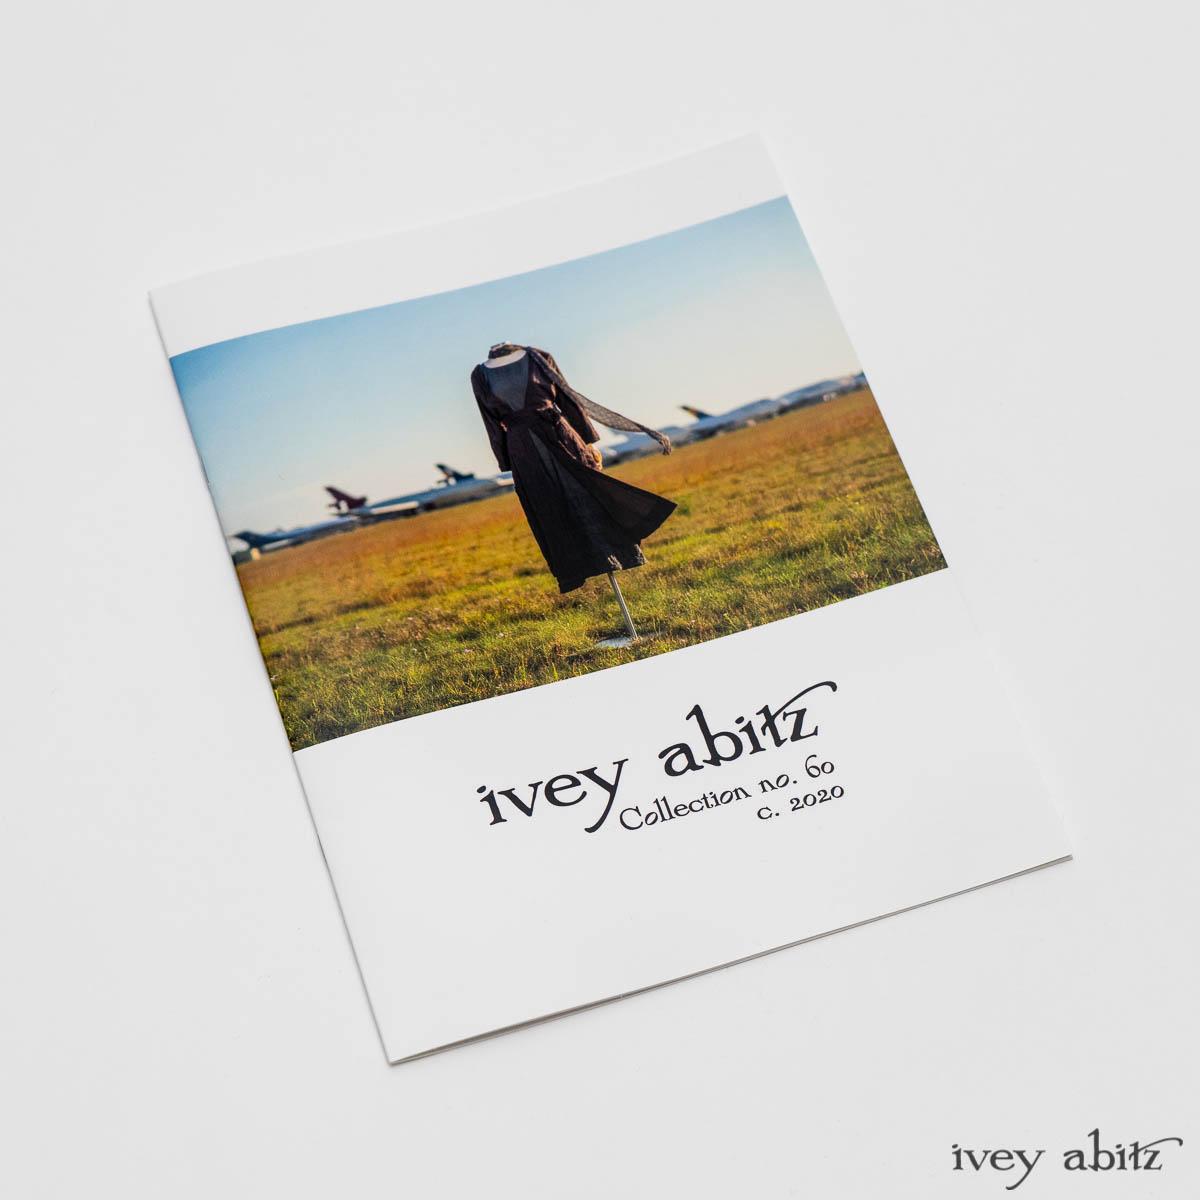 Collection no. 60 c. 2020 Ivey Abitz booklet